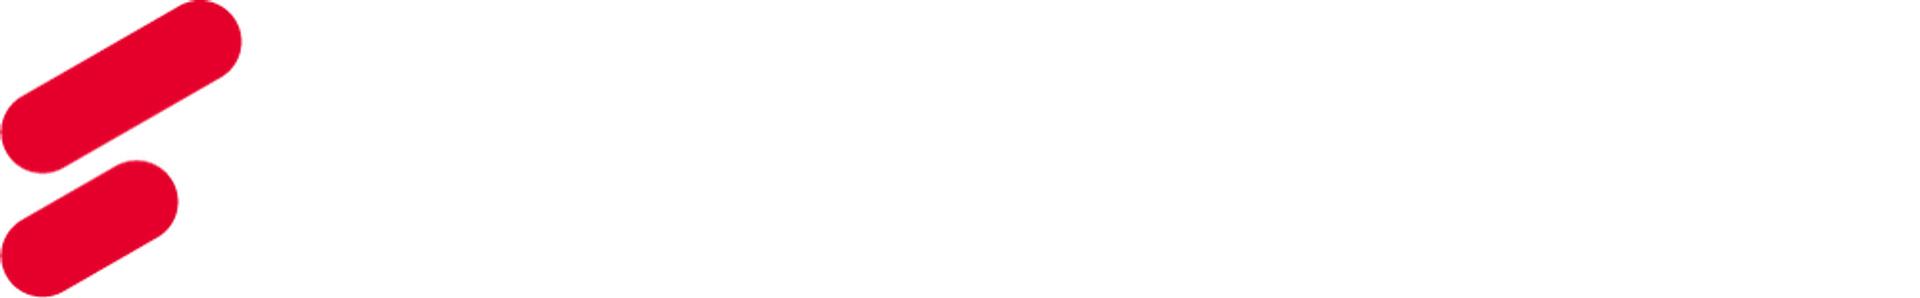 Sportstech_Logo_red-white_RGB (1)